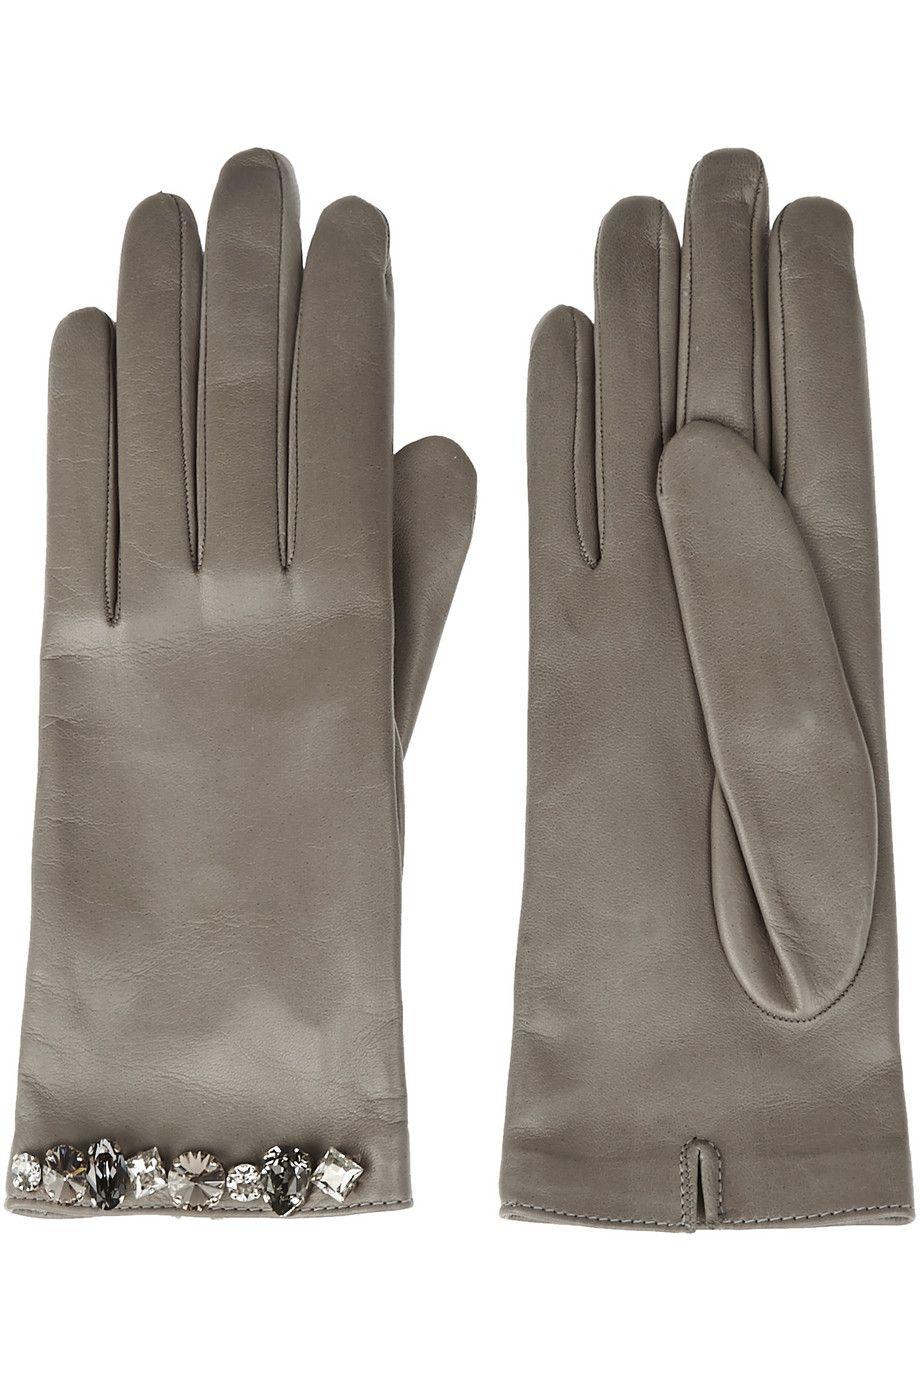 ce65b508c0b Gucci | Swarovski crystal-embellished leather gloves | NET-A-PORTER ...